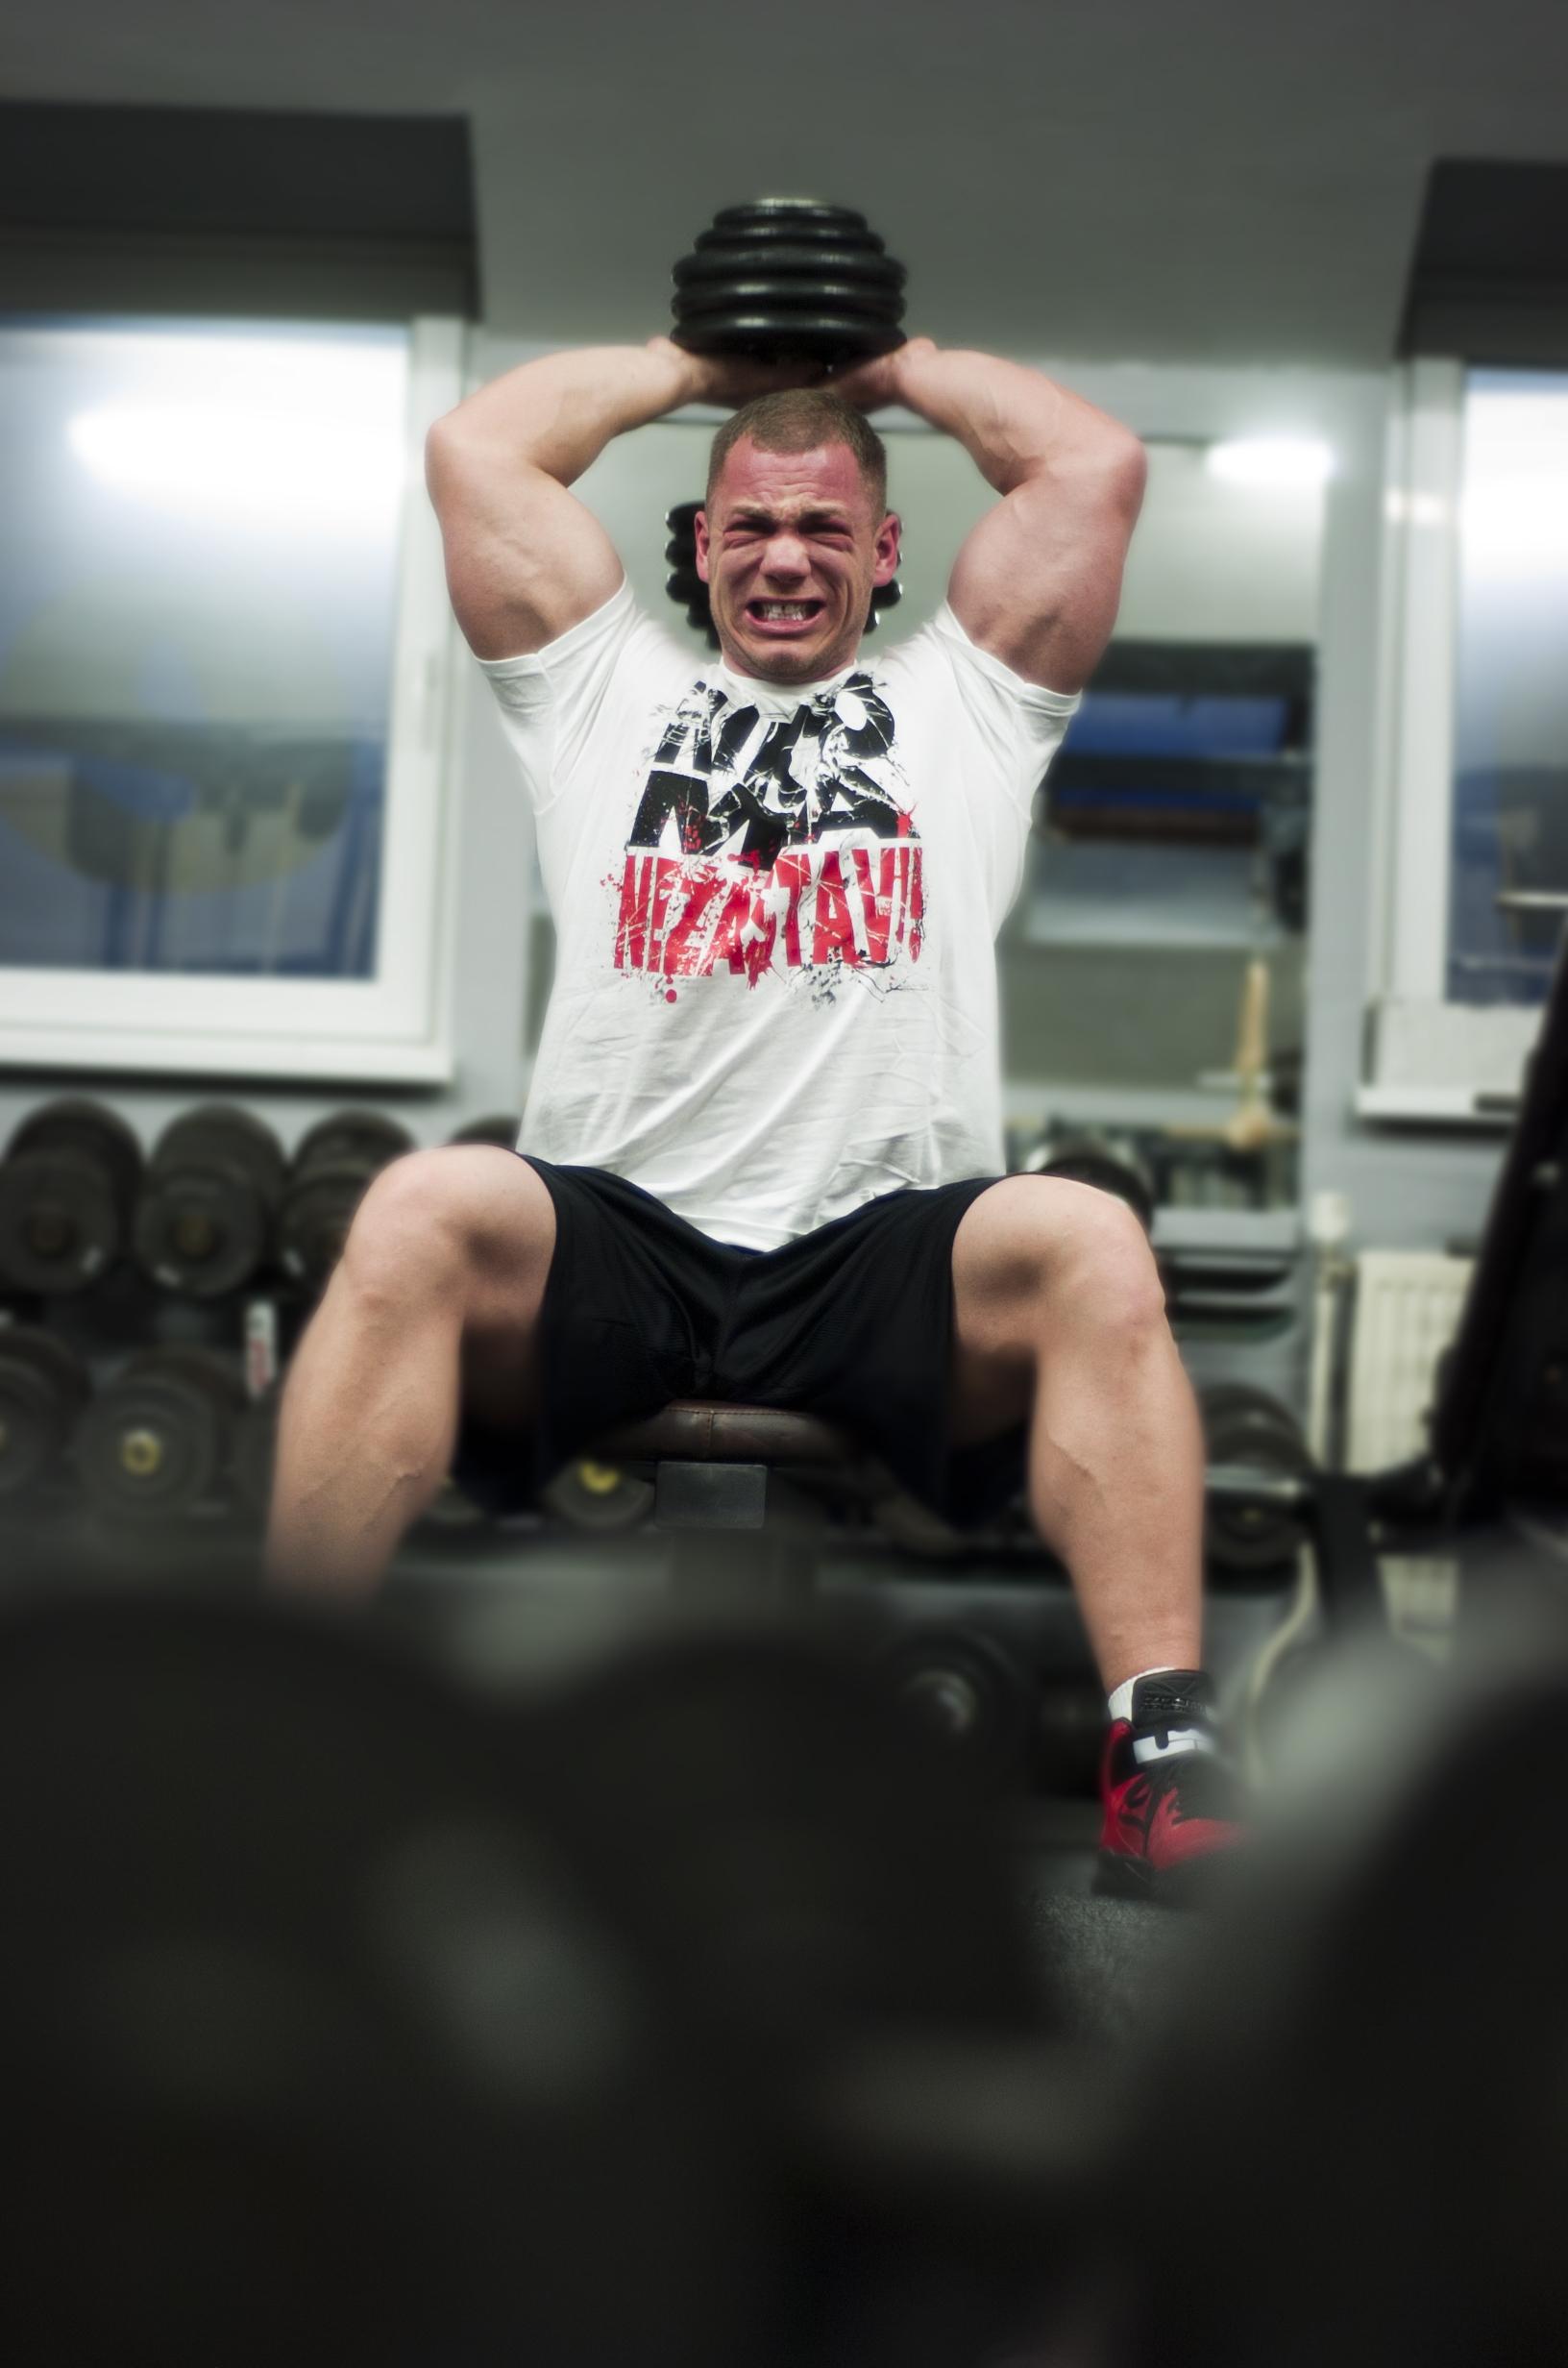 Psychológia športu. Boris Valihora Prekop. Foto: Tomáš Thuringer